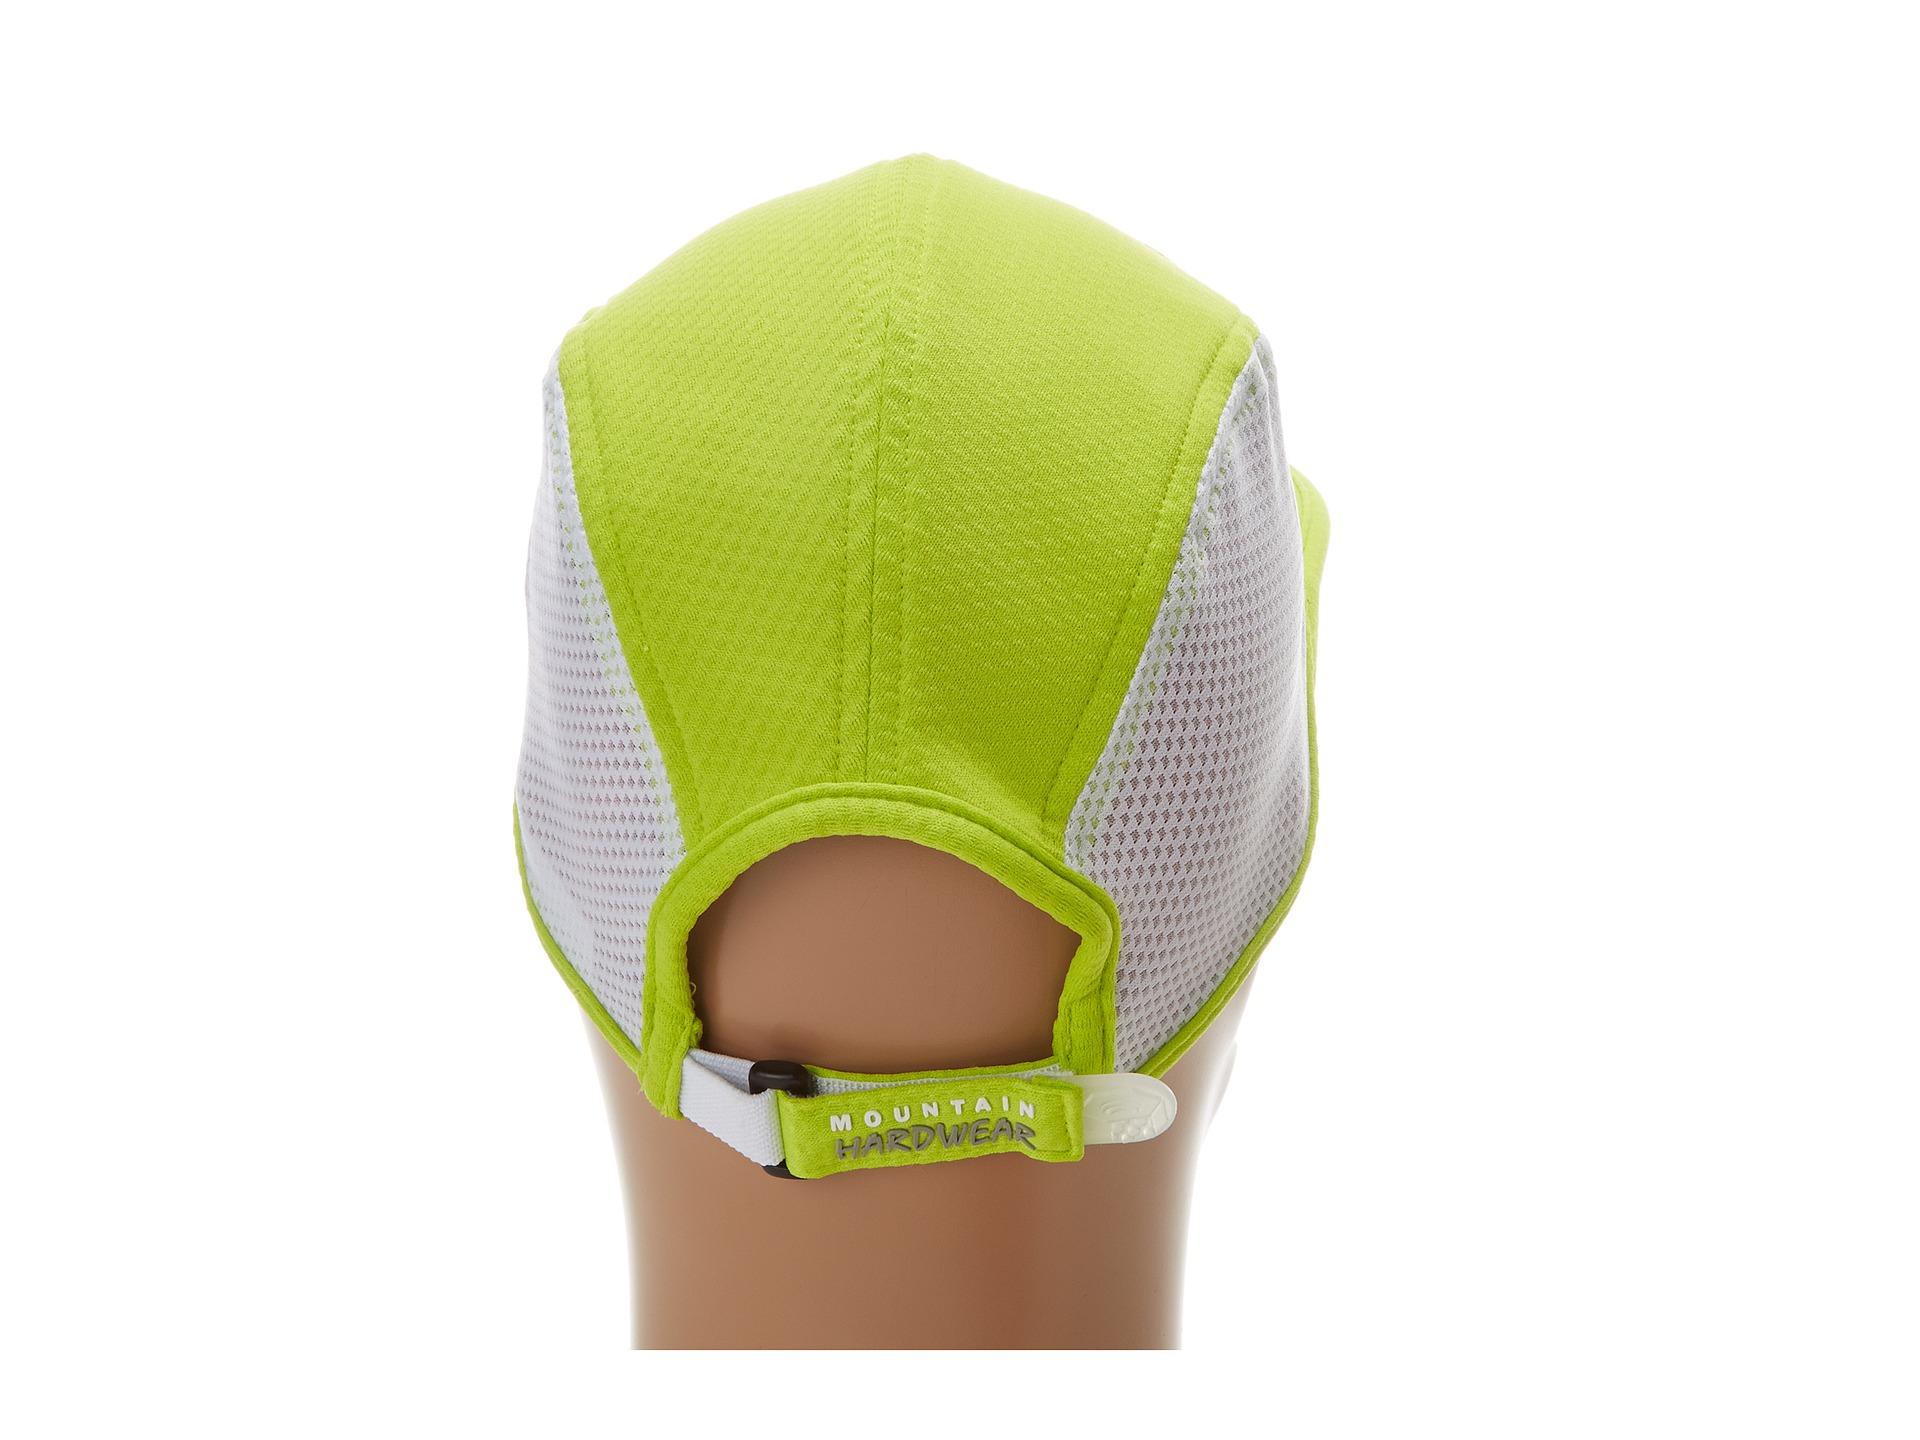 Lyst - Mountain Hardwear Quasar™ Running Cap in Green for Men 36436e5281a